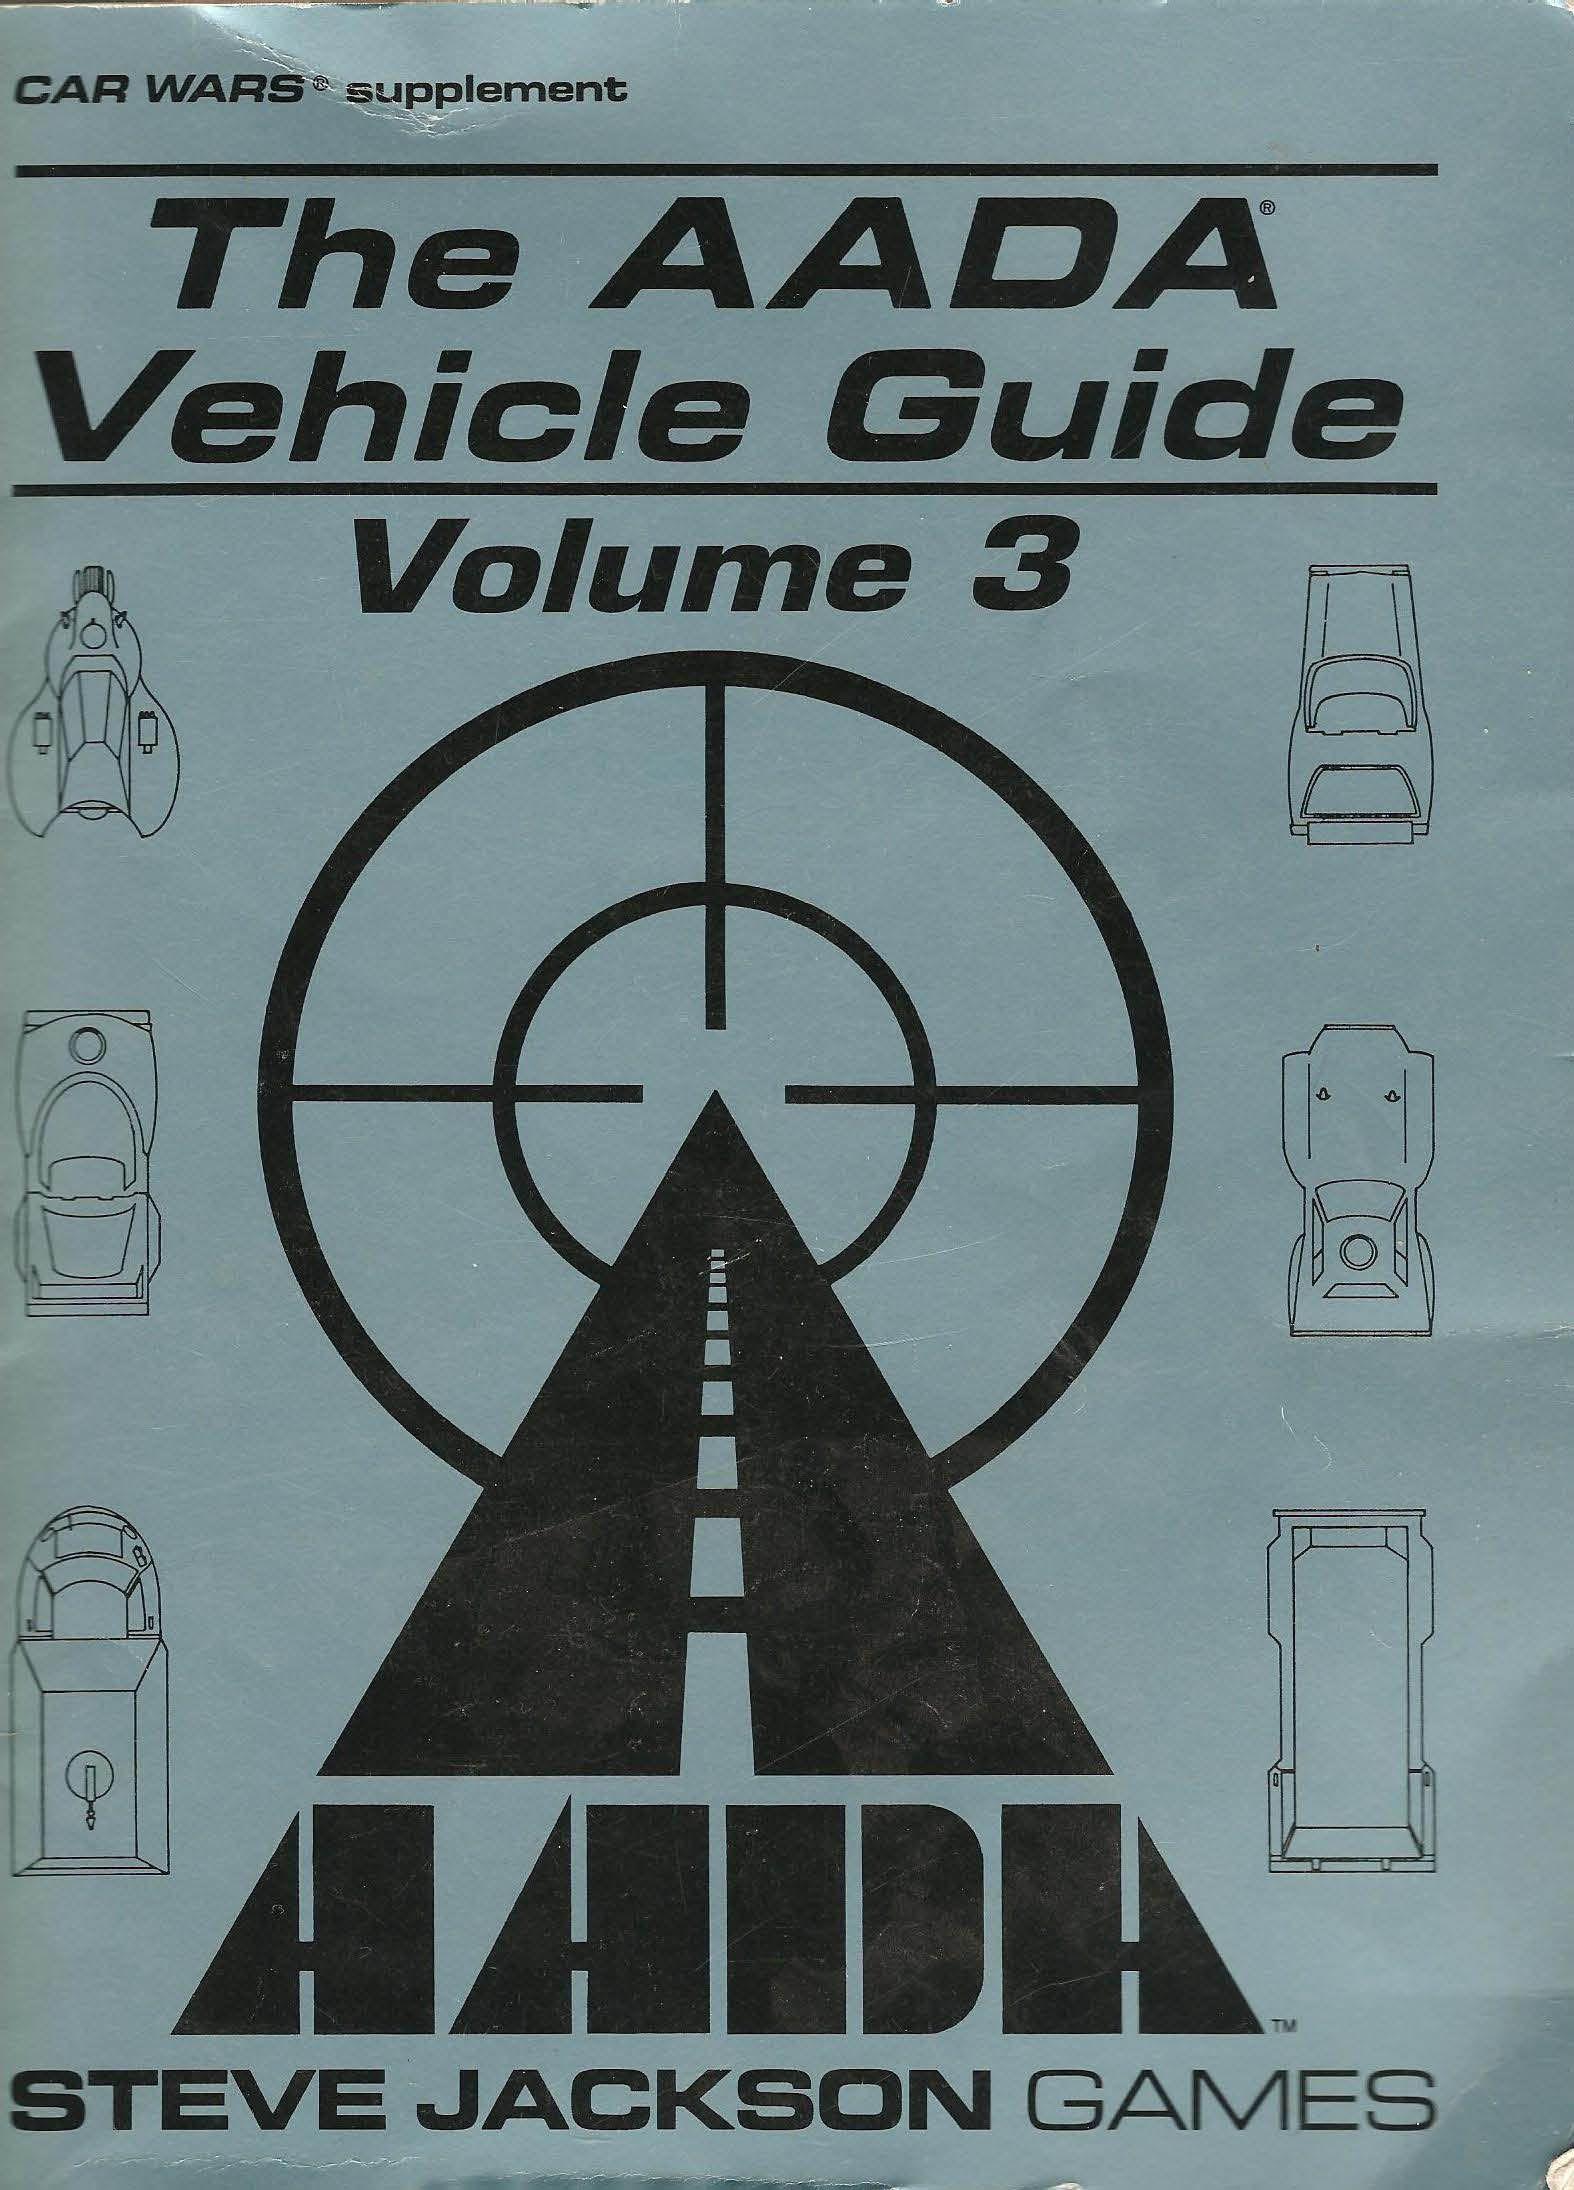 Car Wars Supplement, The AADA Vehicle Guide: Volume 3